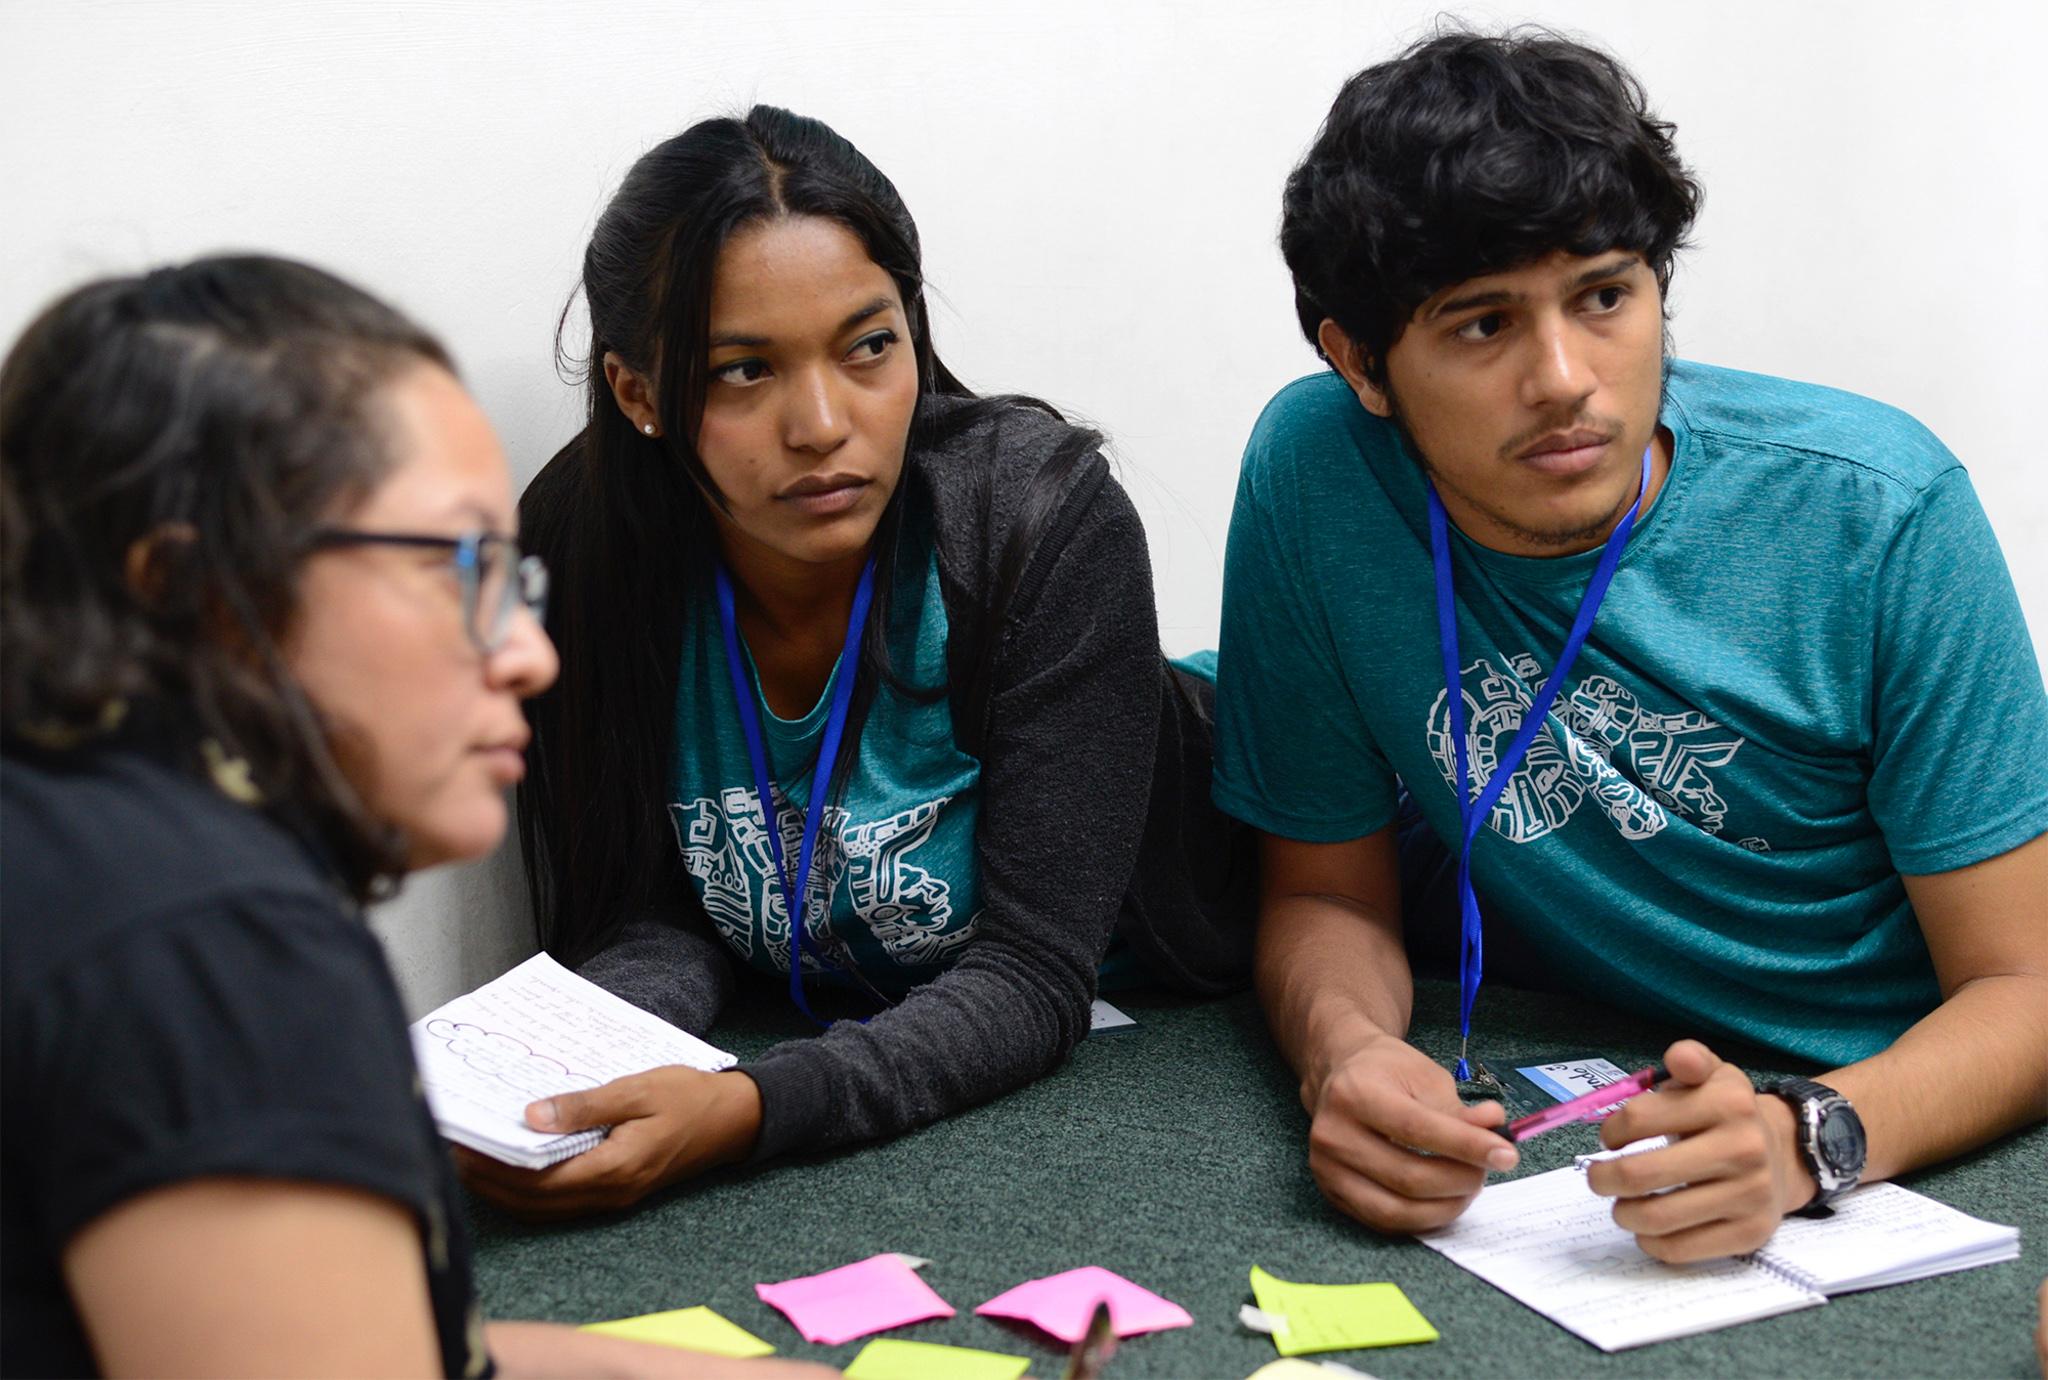 Three seminar participants listening and writing ideas (U.S. Embassy of Tegucigalpa)